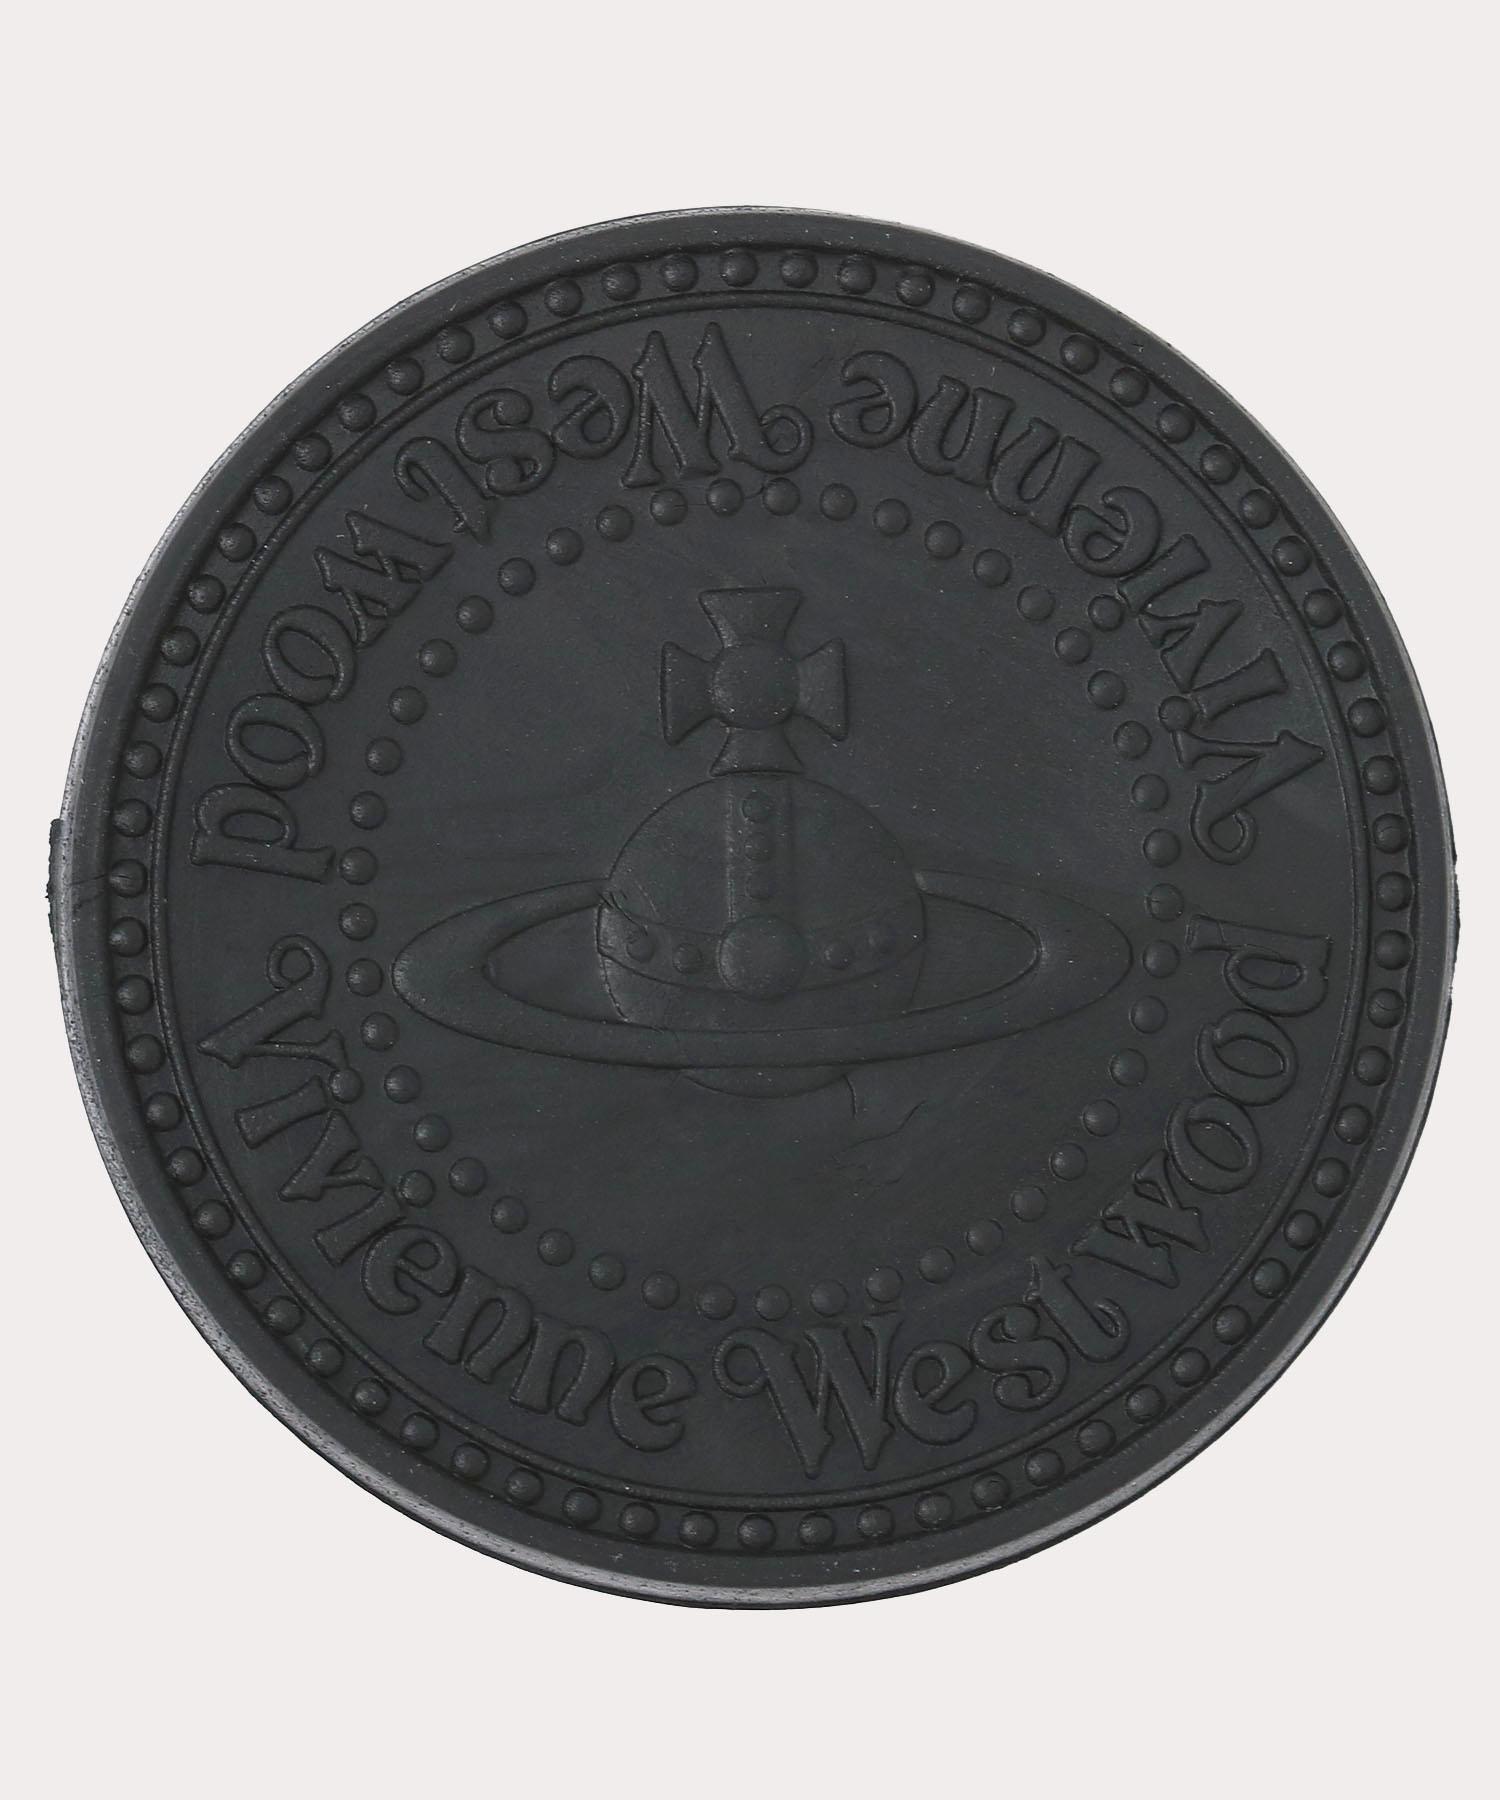 BRASS COIN ペンスタンド(ペン・消しゴム付)